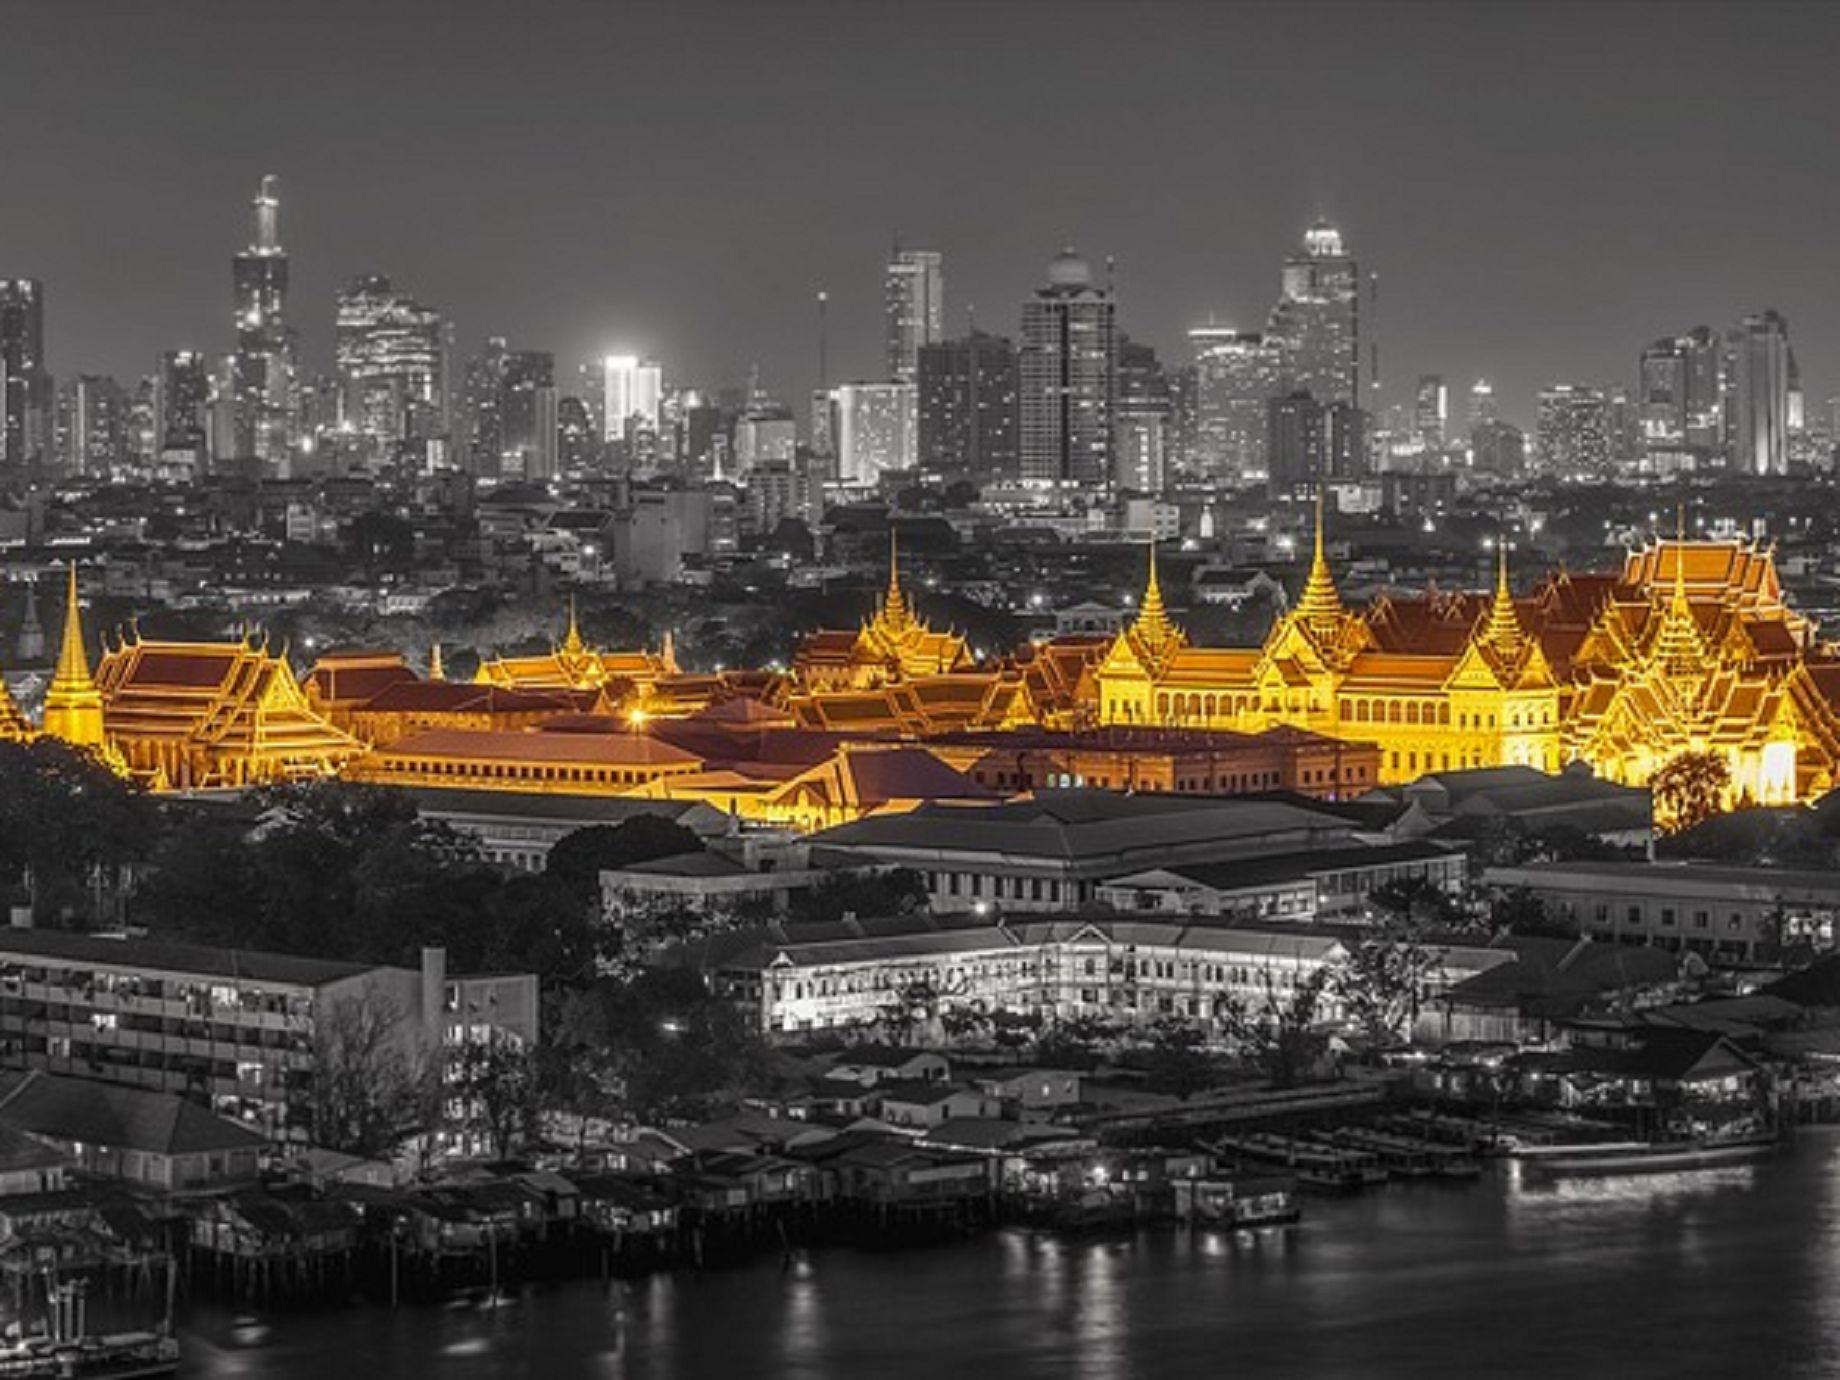 UP!東南亞數位廣告花費上升,潛力國家印尼、越南、菲律賓入列